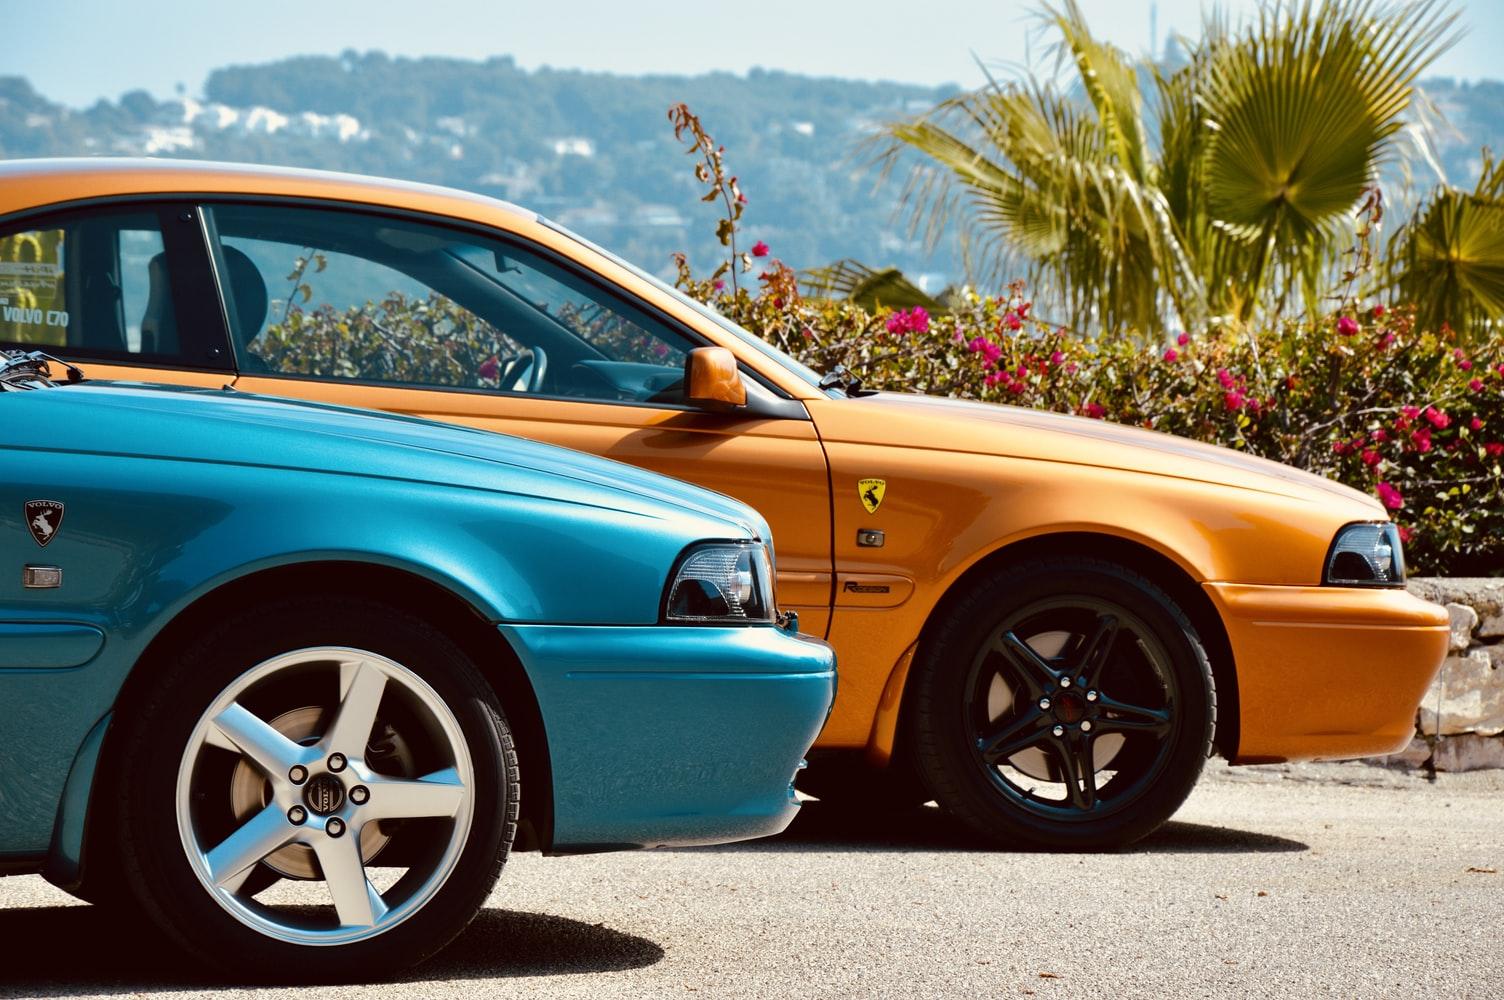 Volvo 70 C70  Coupe 1997 ManuelMena Unsplashphoto photo-1574935268041-f8cc6af964c8